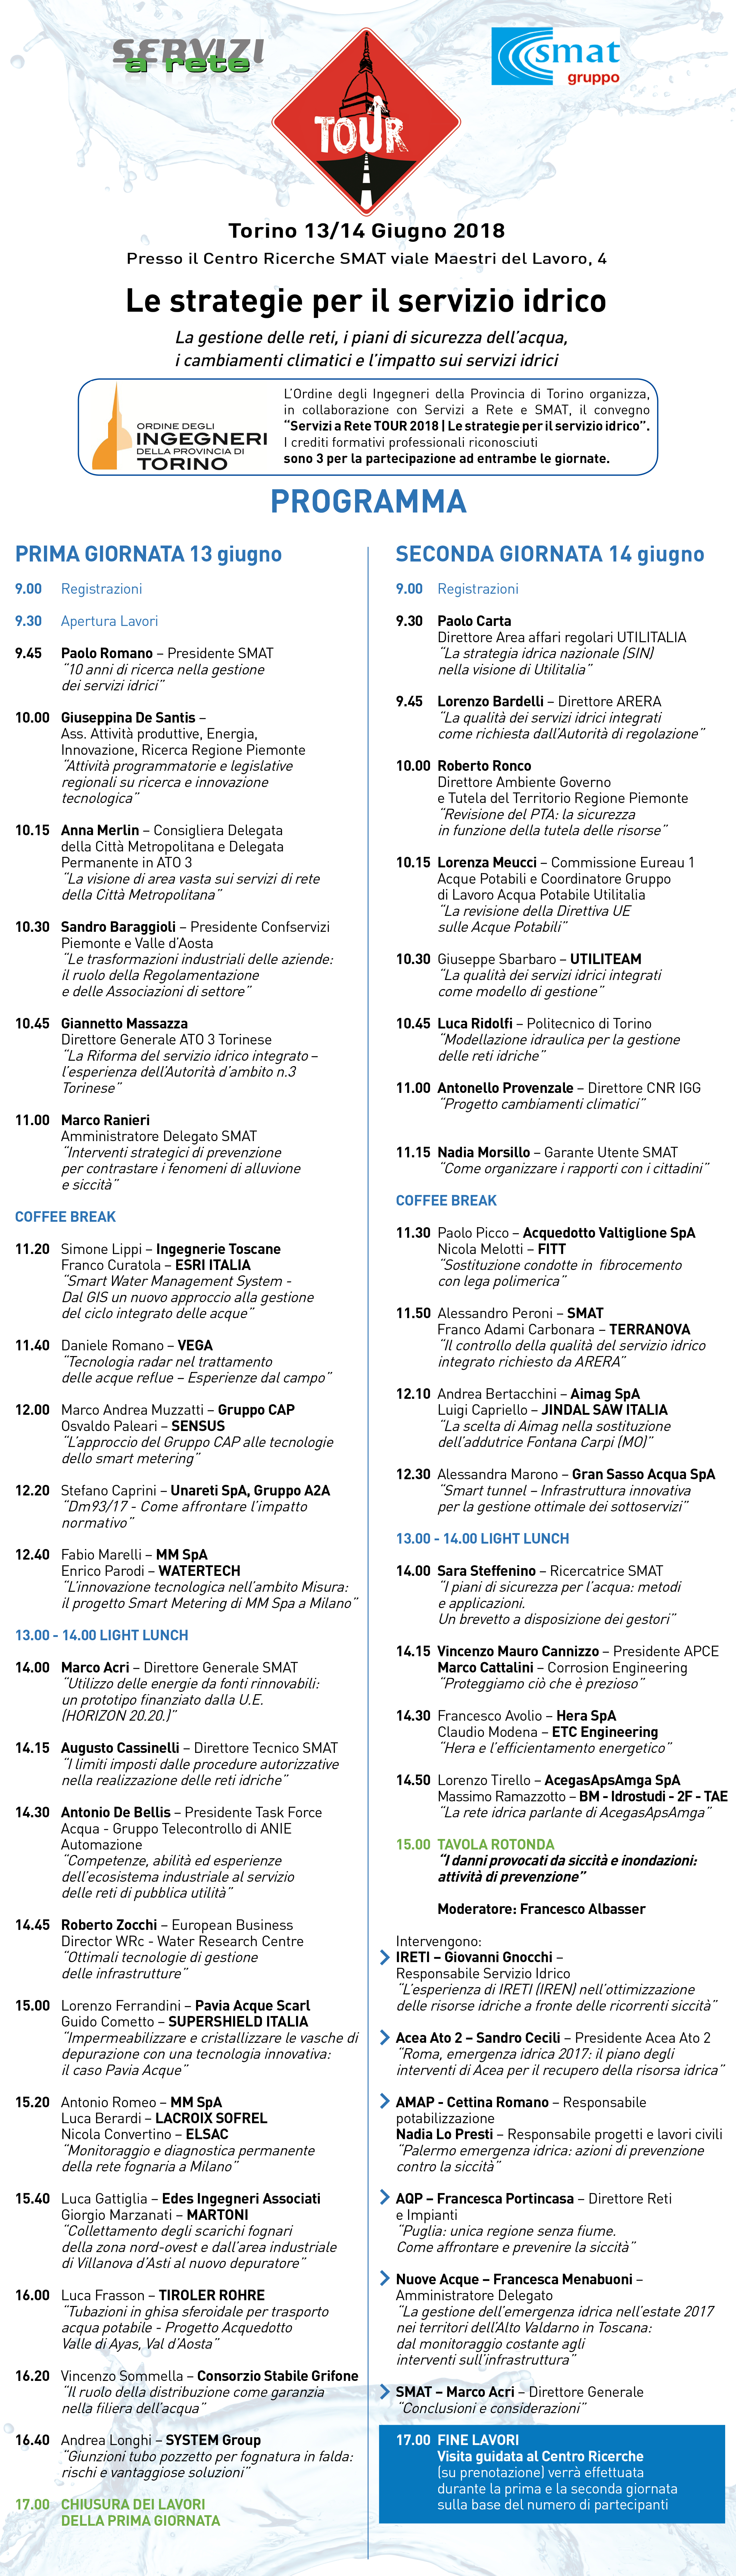 programma-2018_okpost-evento-v2